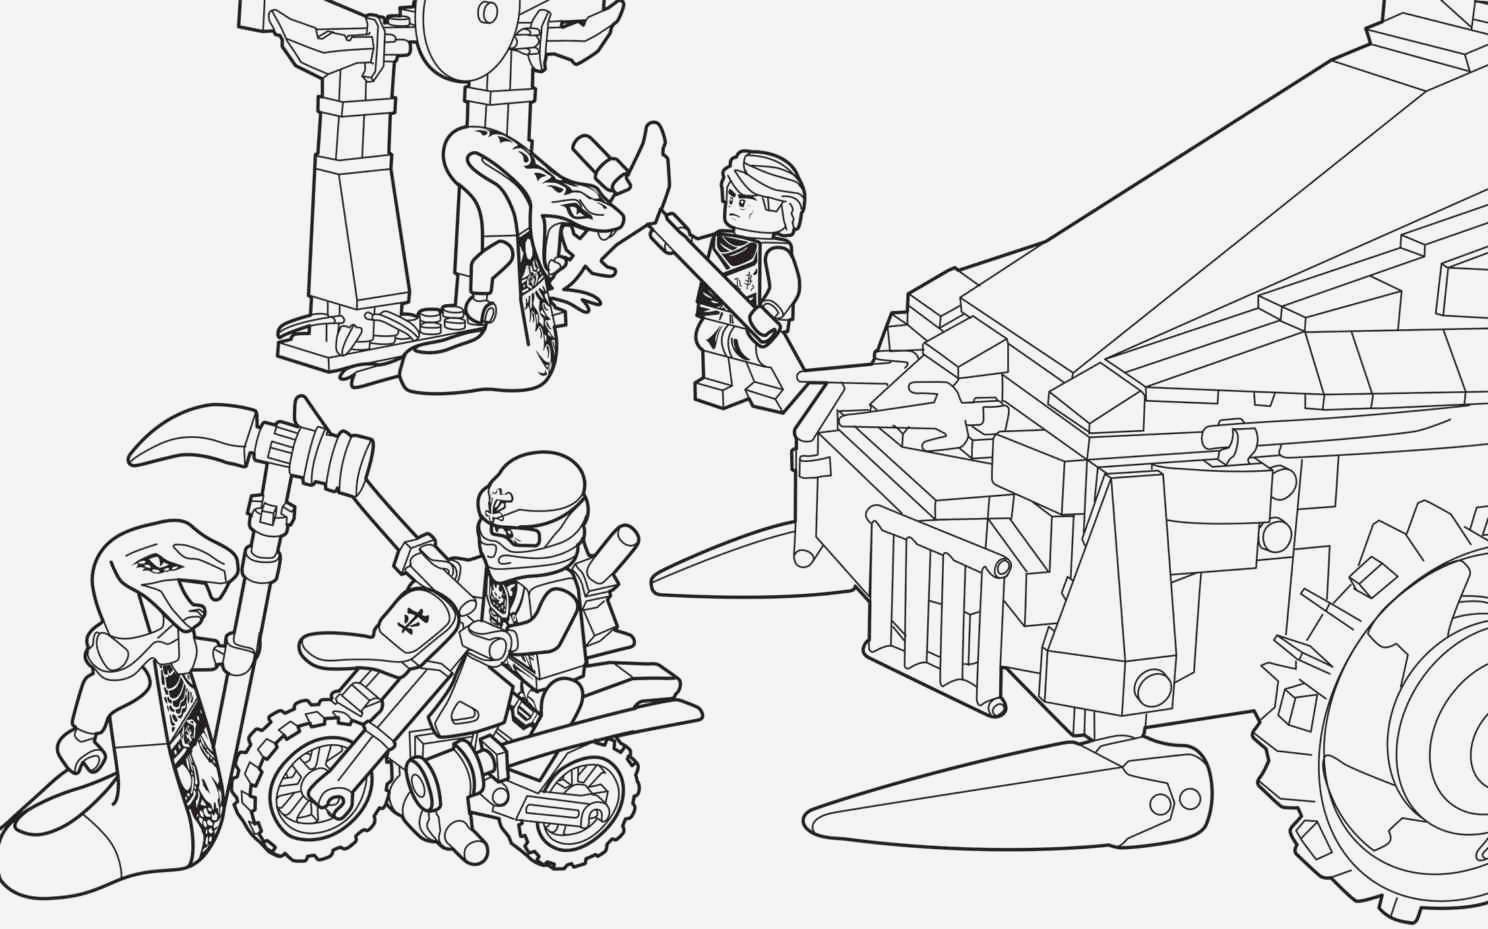 Lego Elves Ausmalbilder Neu Verschiedene Bilder Färben Ausmalbilder Lego Elves Bild